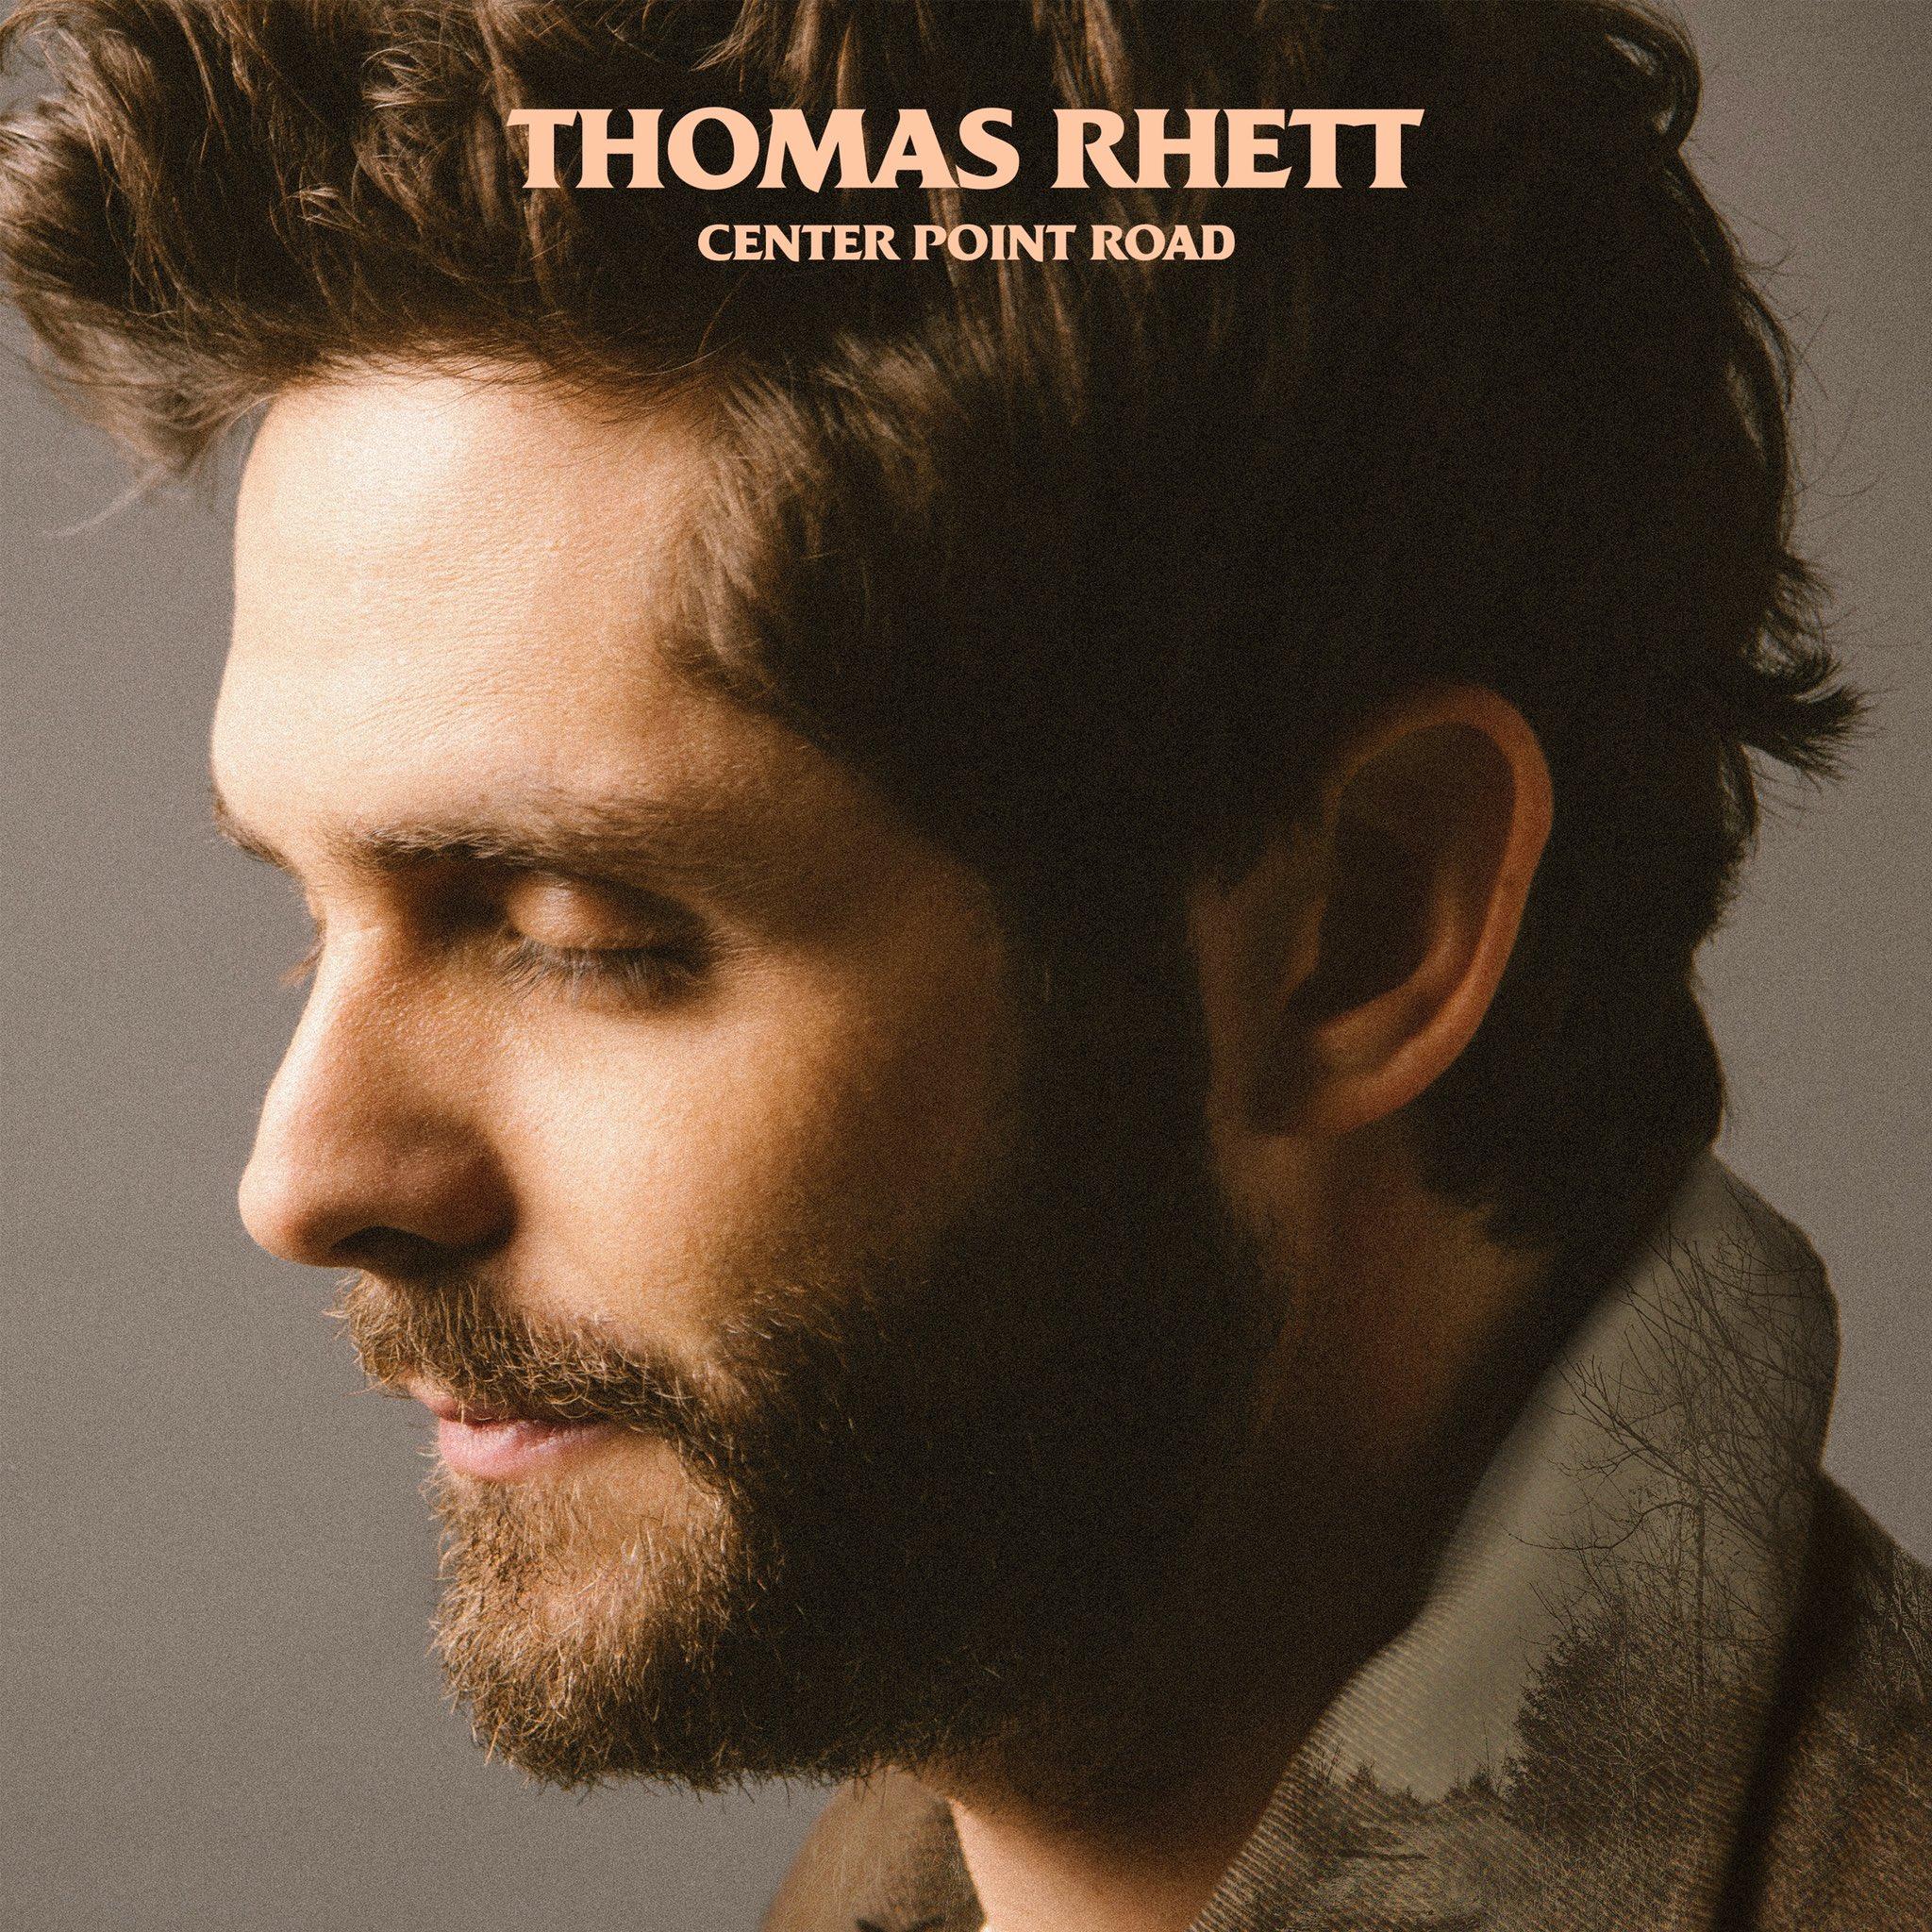 Thomas Rhett @ ThomasRhett